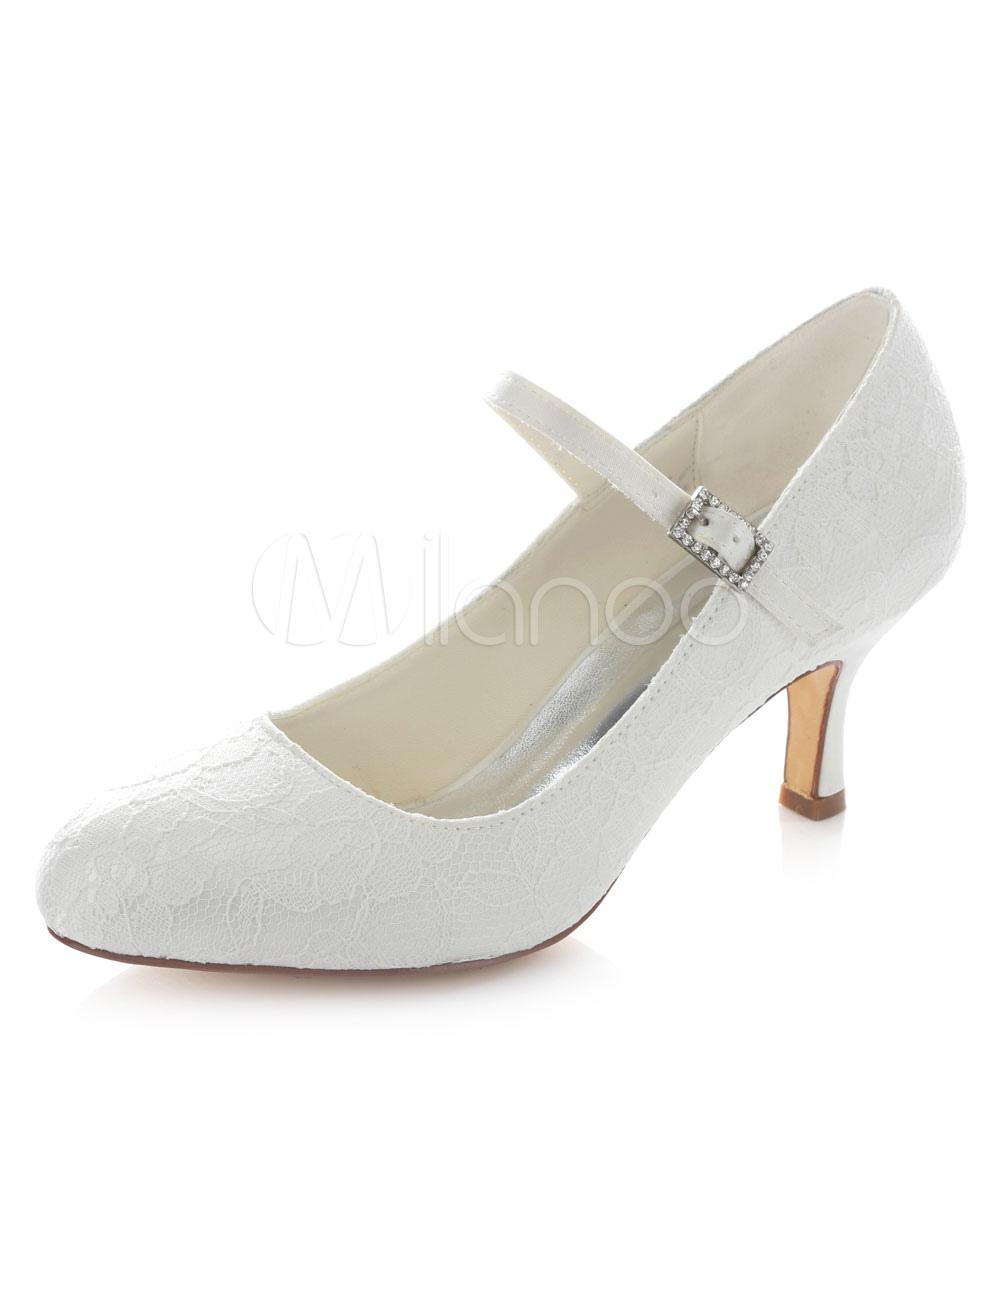 White Bridal Pumps Straps Satin Wedding Heels for Women